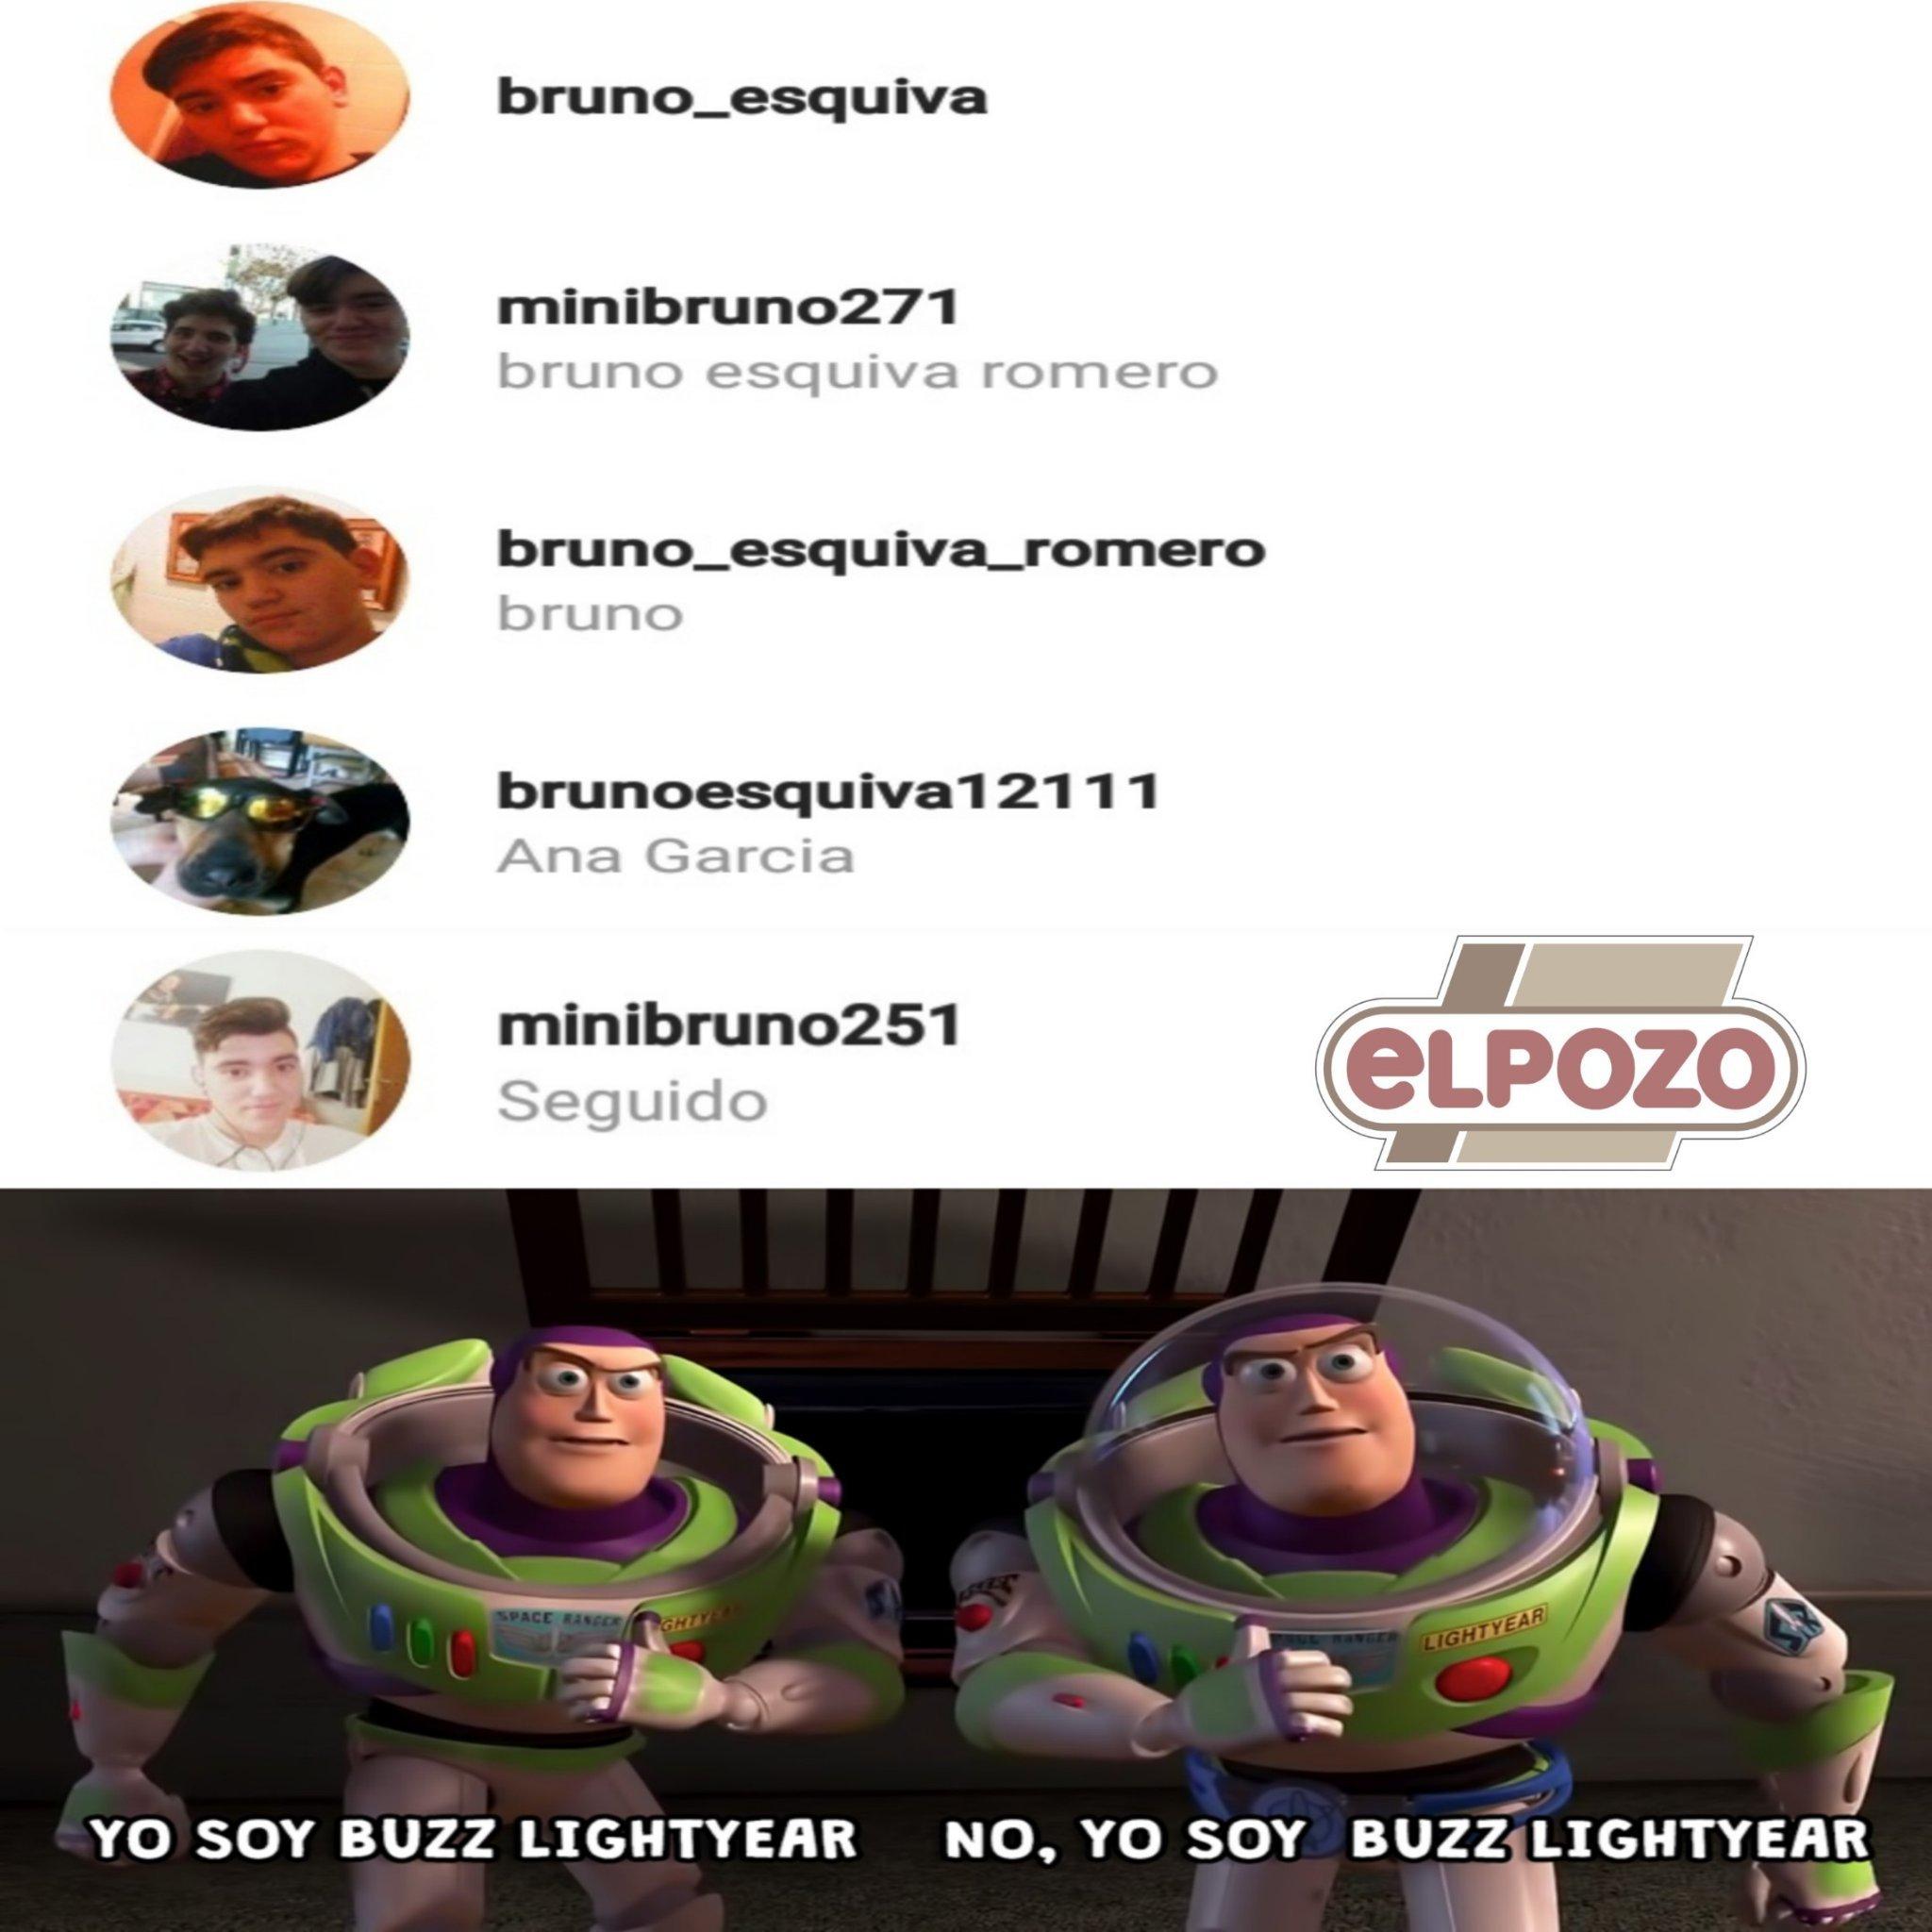 Ste Bruno - meme